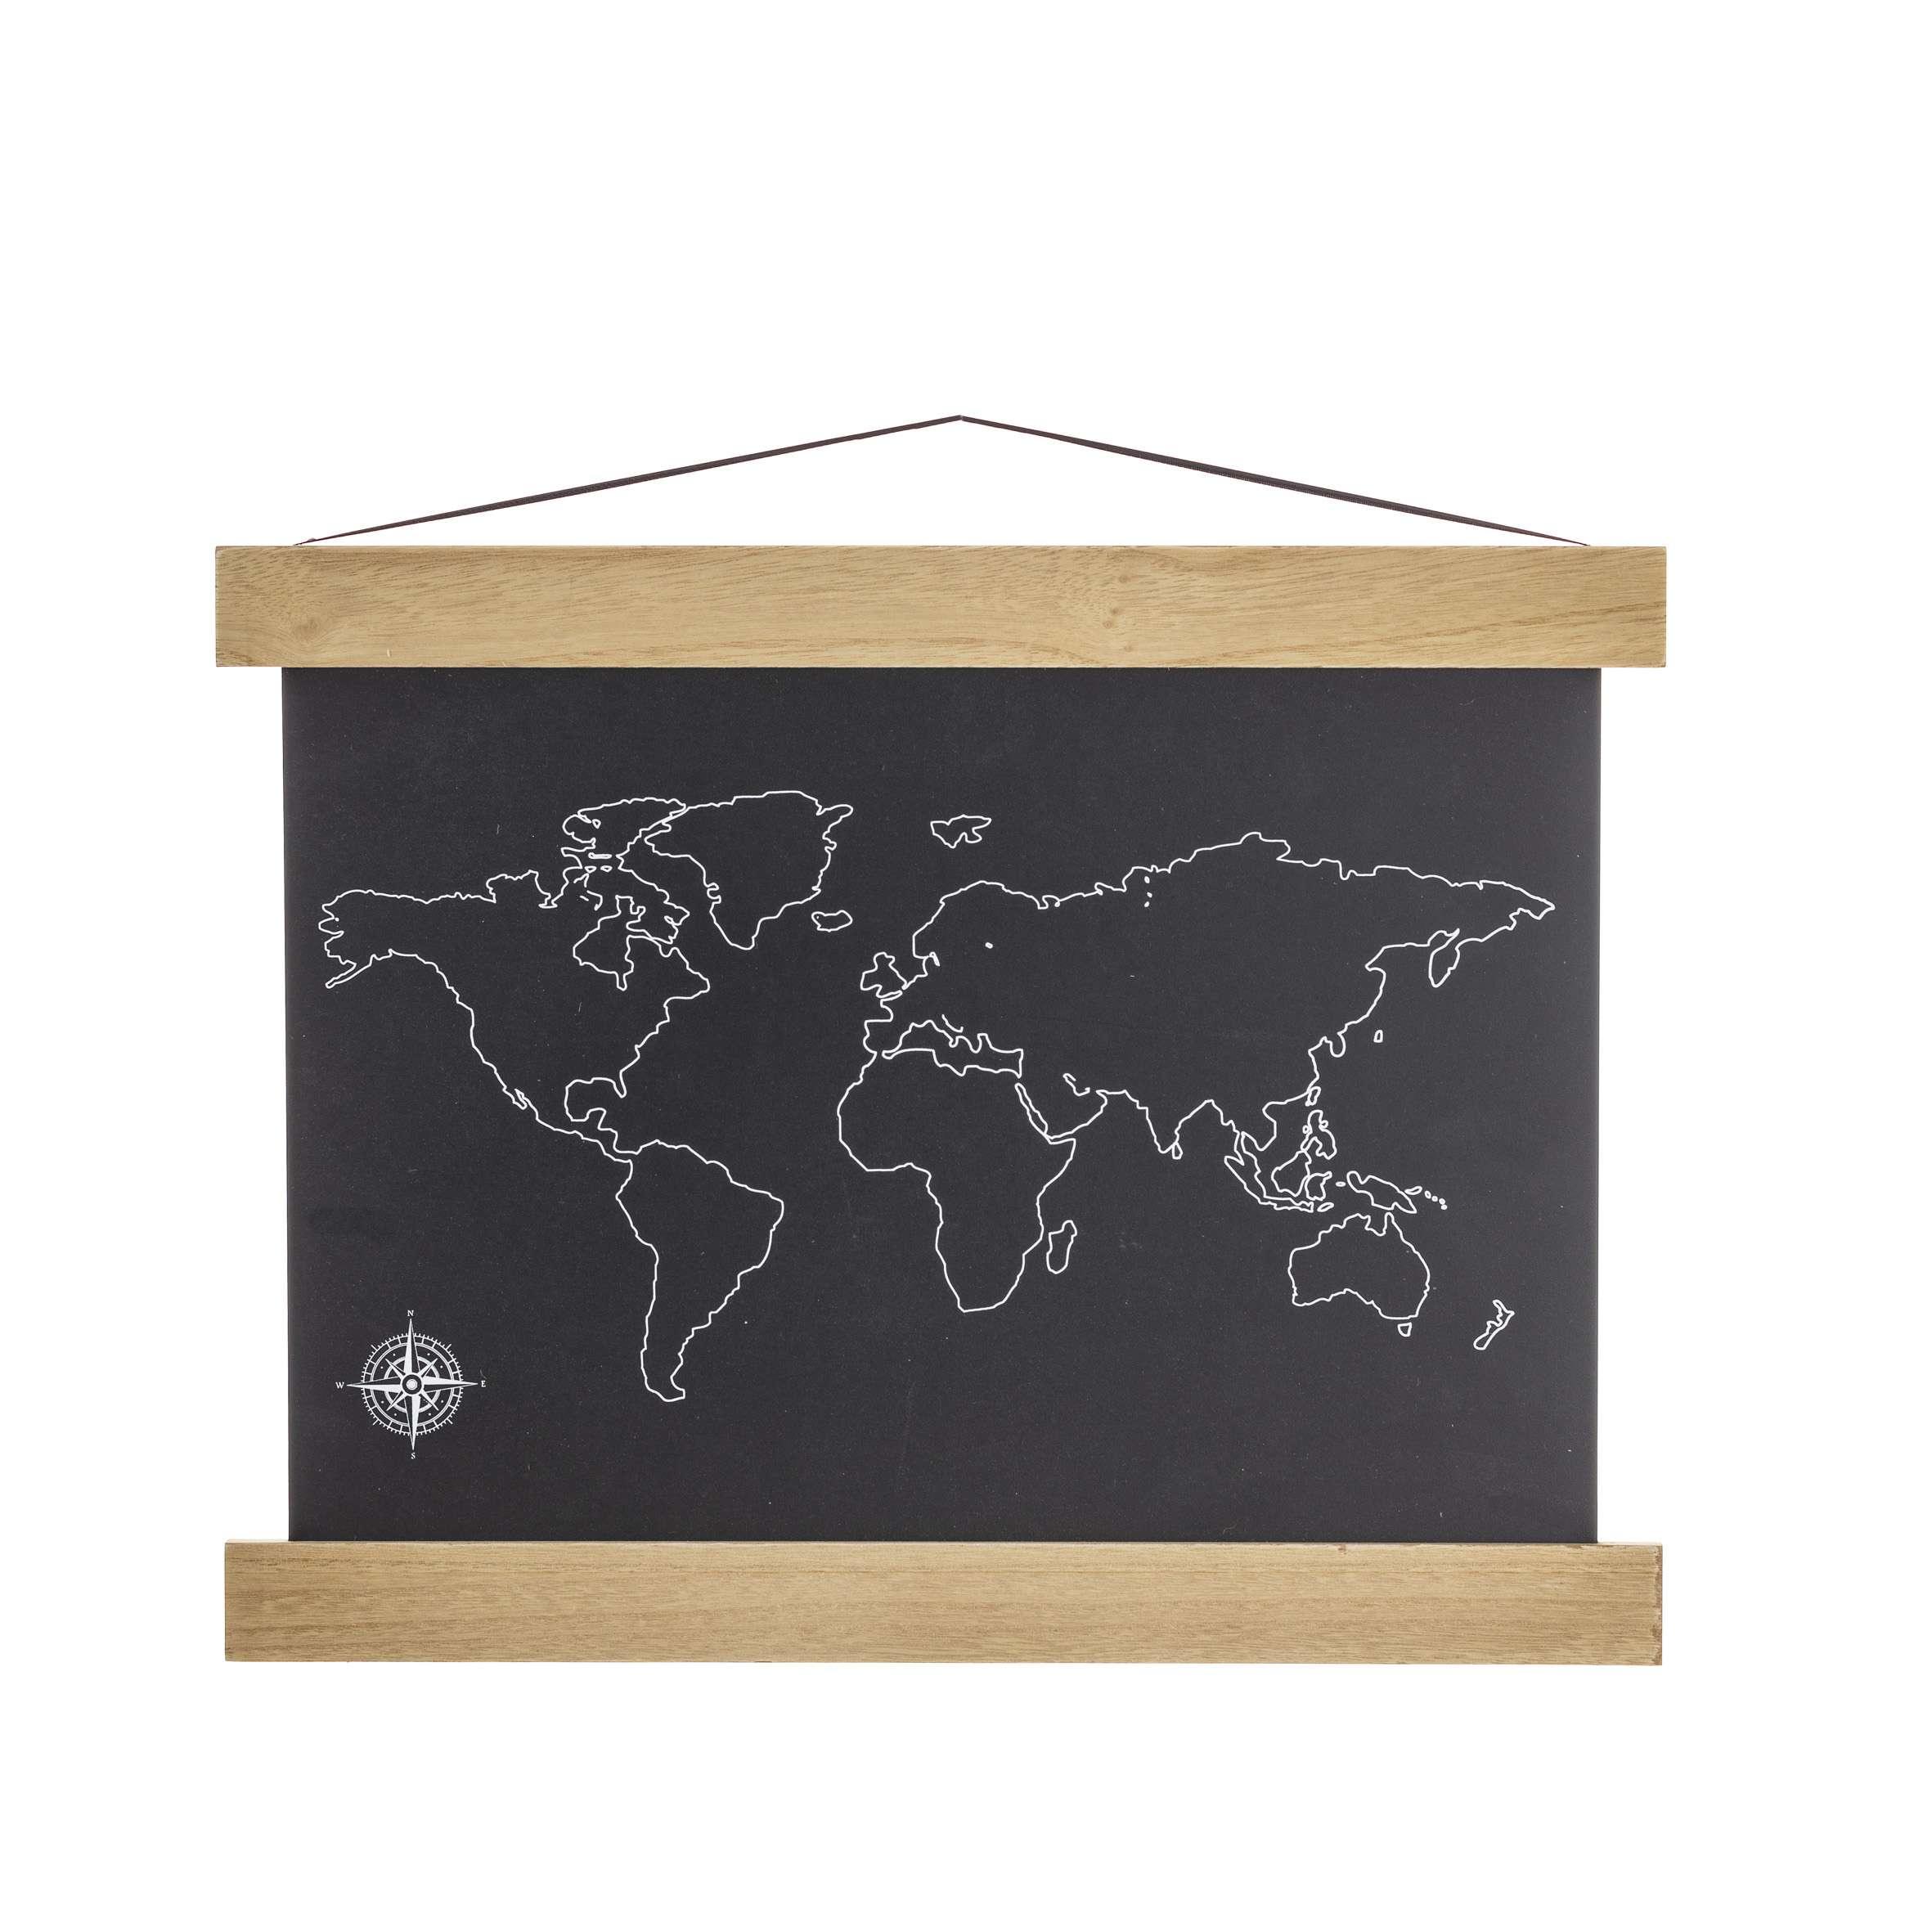 The Map chalkboard